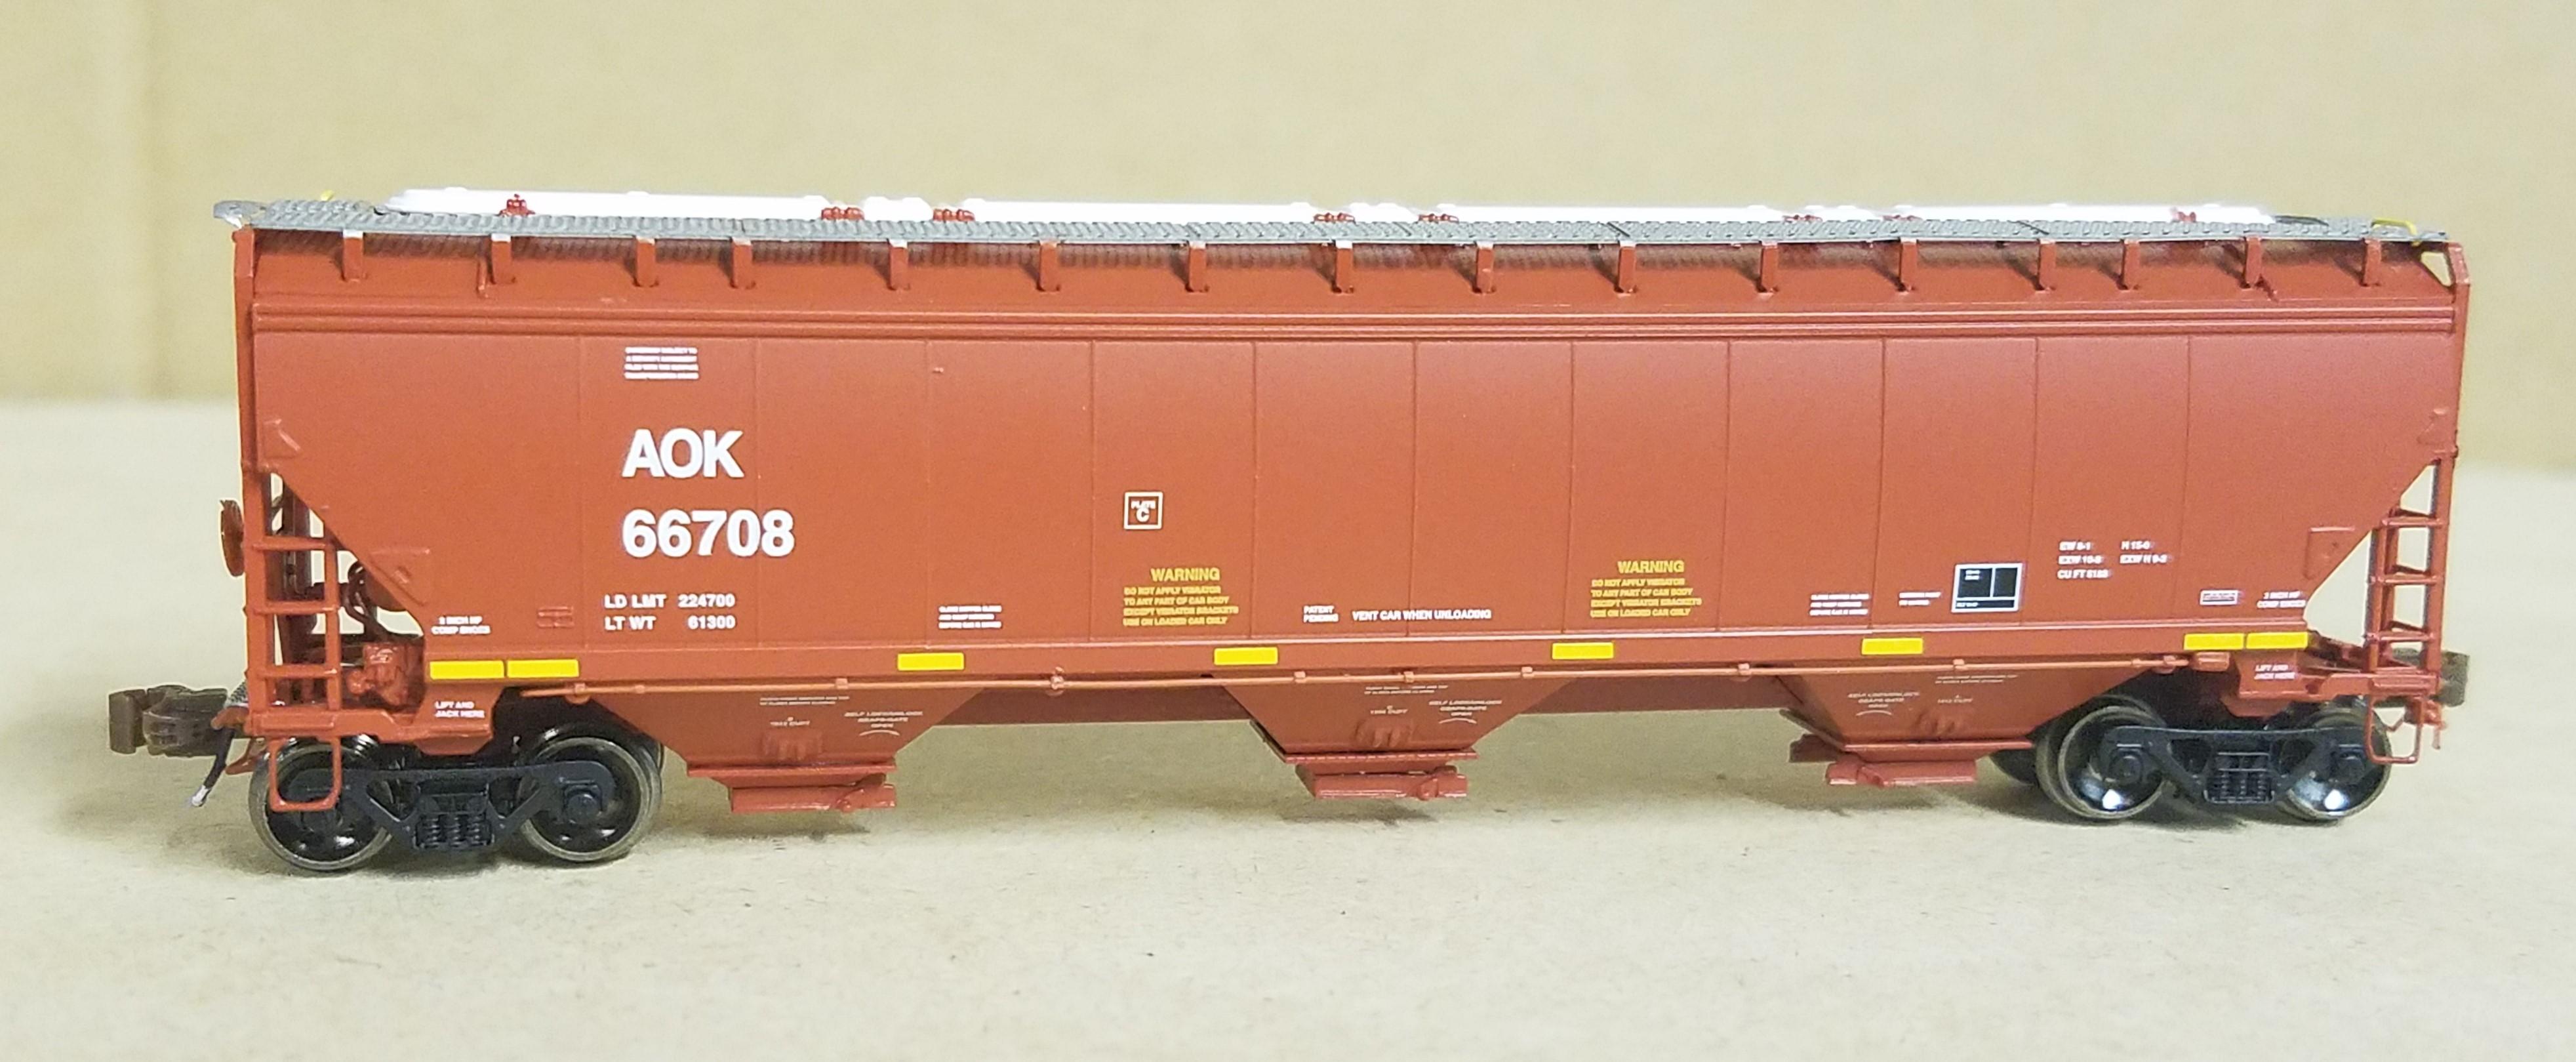 N Scale - ScaleTrains.com - SXT30904 - Covered Hopper, 3-Bay, Gunderson 5188 - Arkansas-Oklahoma - 66708